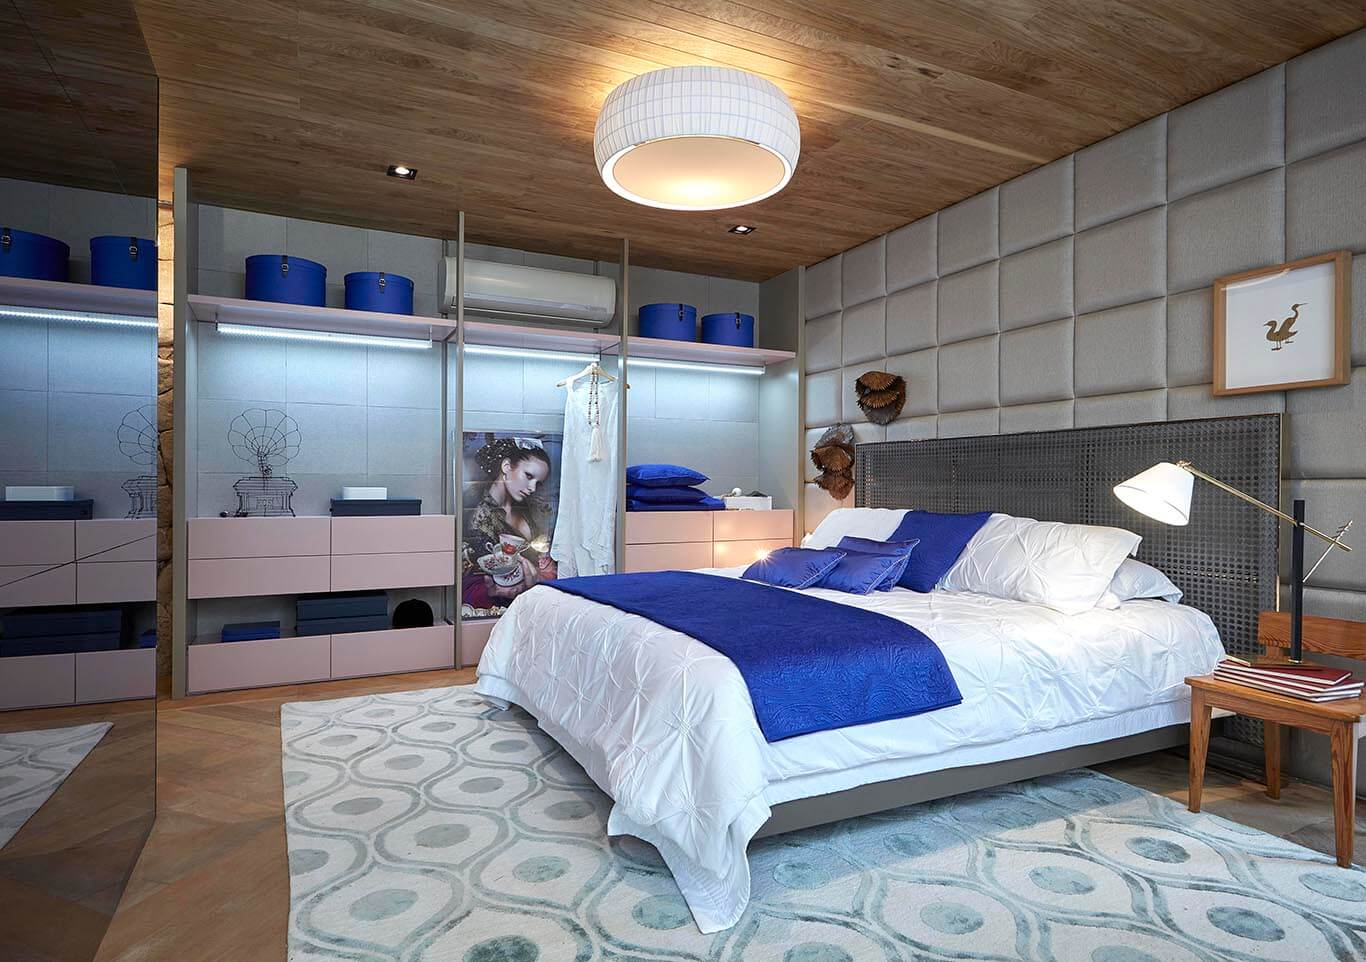 Dell Anno - Dormitório Ideias e Projetos3